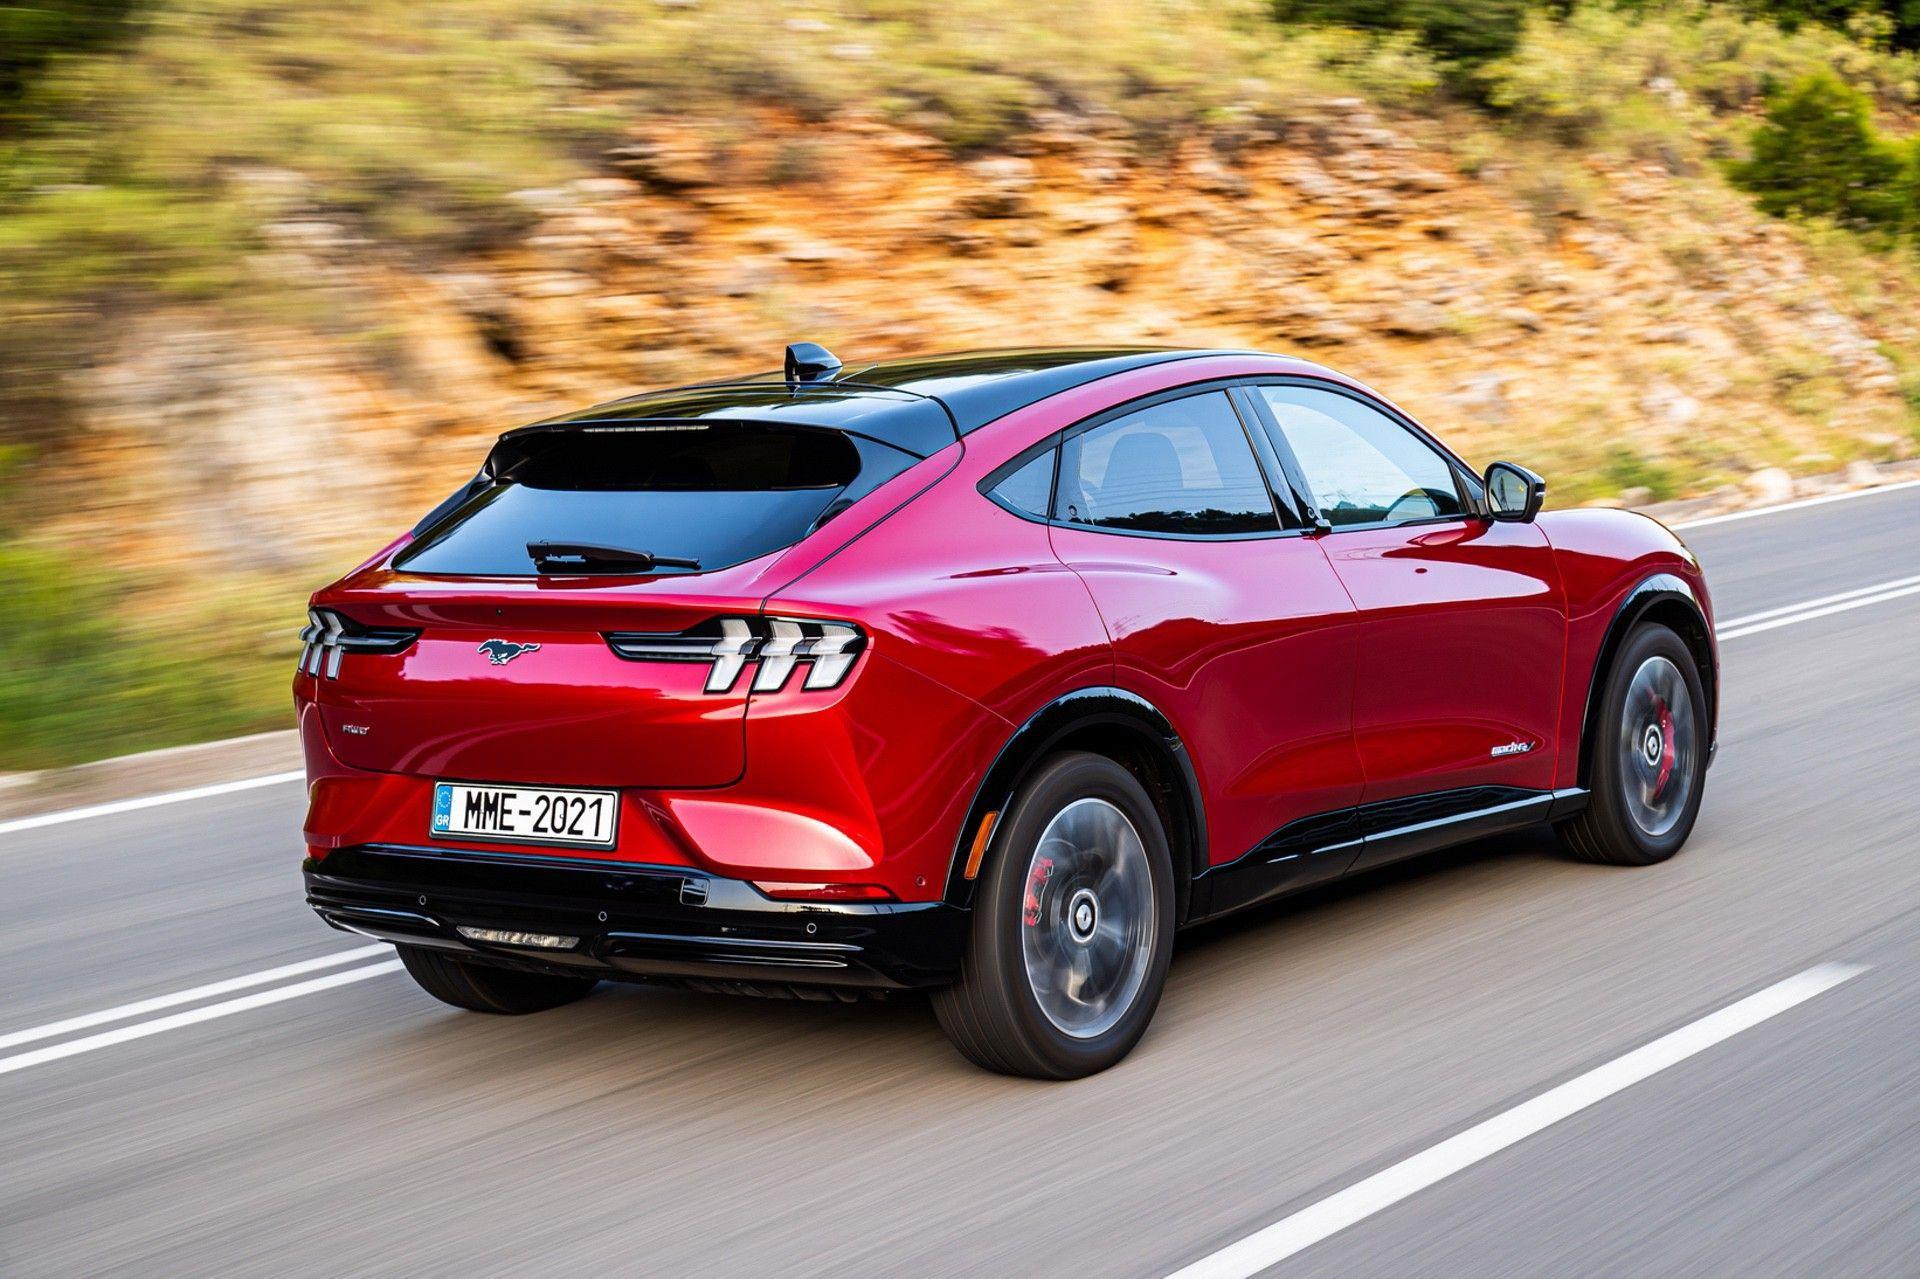 Ford_Mustang_Mach-E_greek_presskit-0130